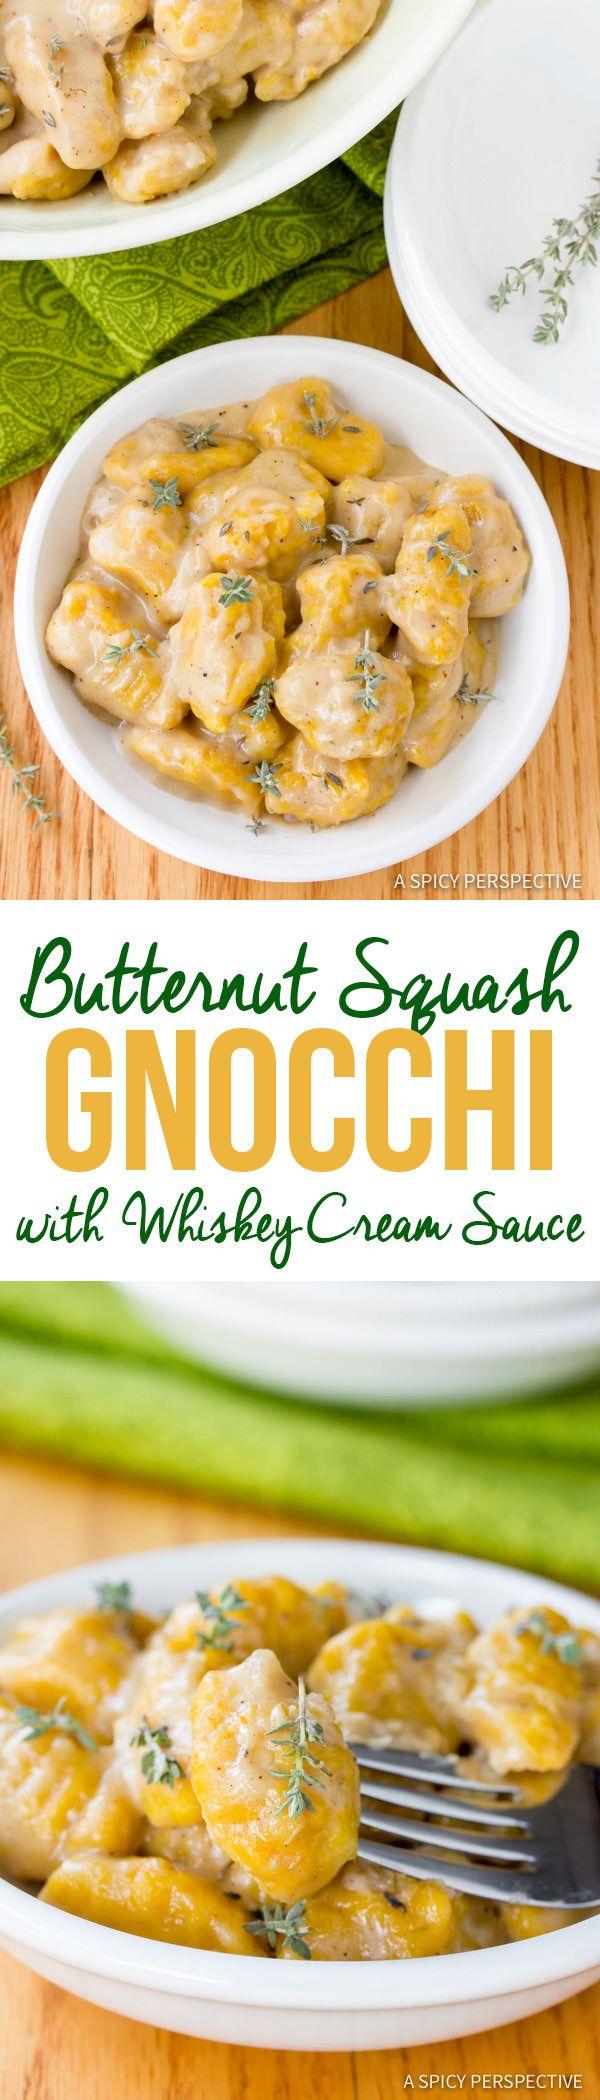 Amazing Butternut Squash Gnocchi with Whiskey Cream Sauce | ASpicyPerspective.com